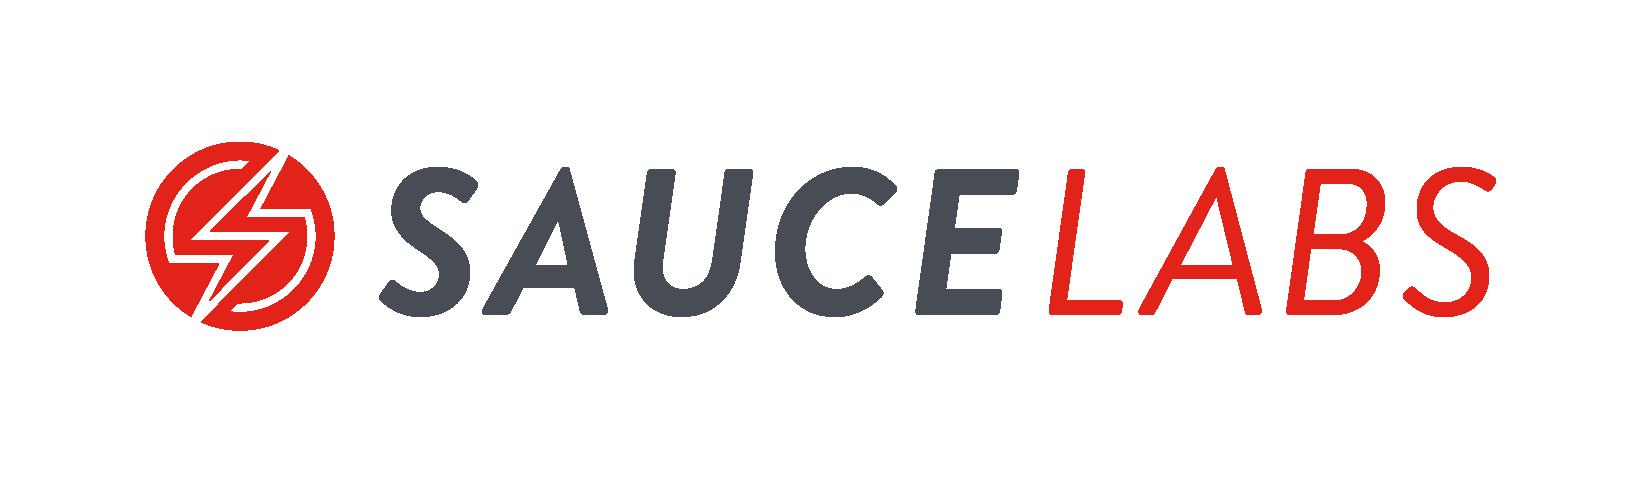 Sauce labs logo horizontal